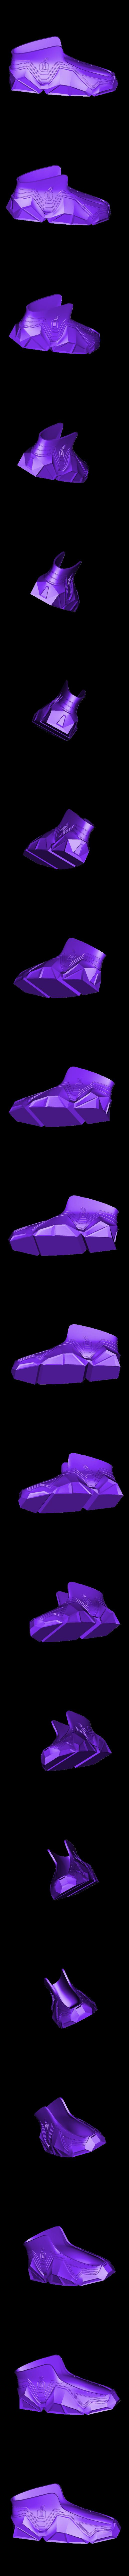 sneaker_-_reduced_file_size.stl Download free STL file SNEAKERBOT in FILAFLEX by Recreus • 3D printable design, Ignacio